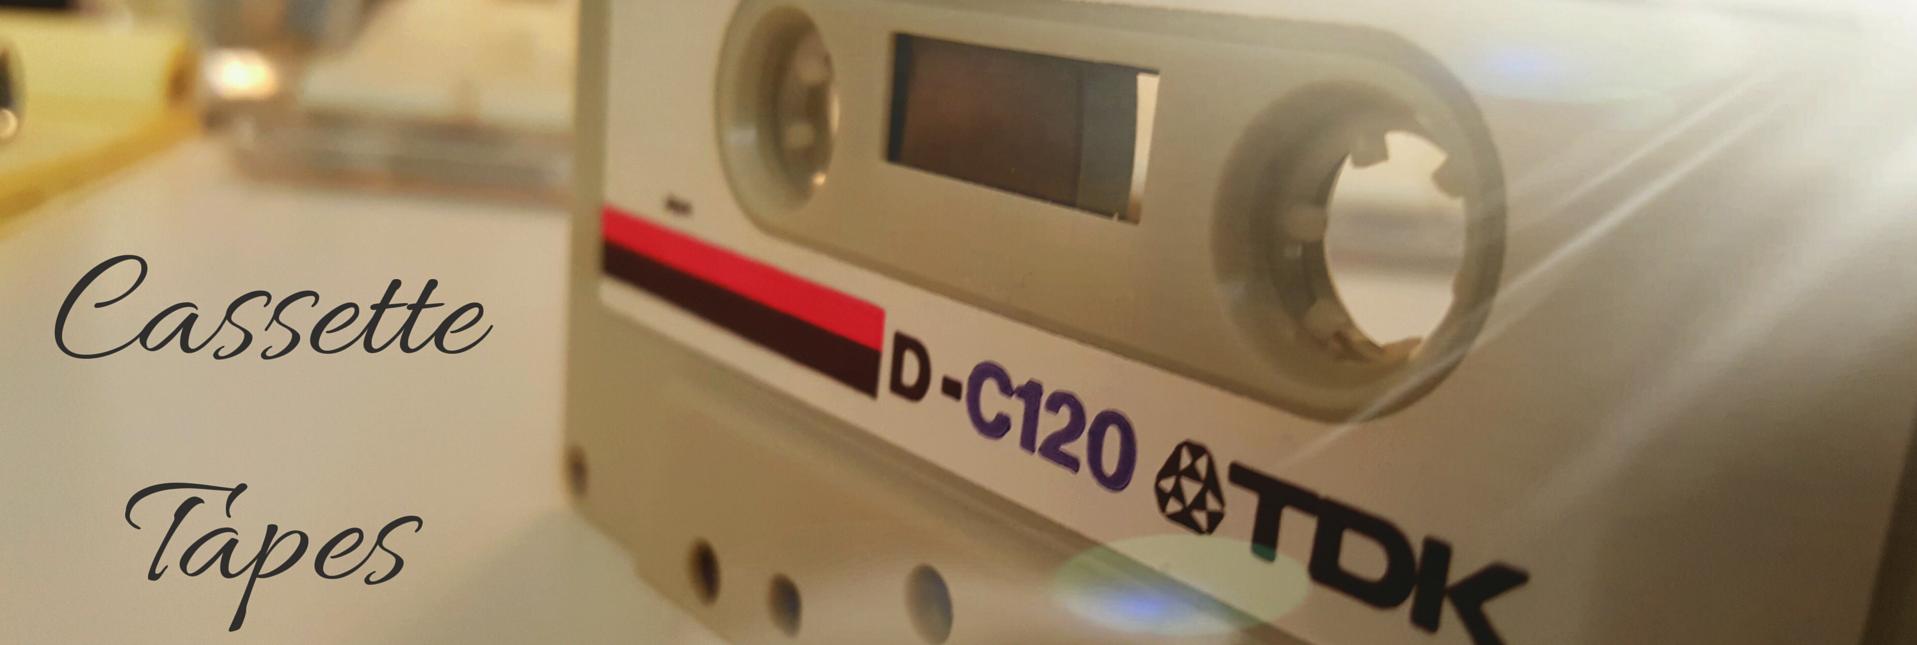 Speak House Audio Transfers-Cassette Tapes